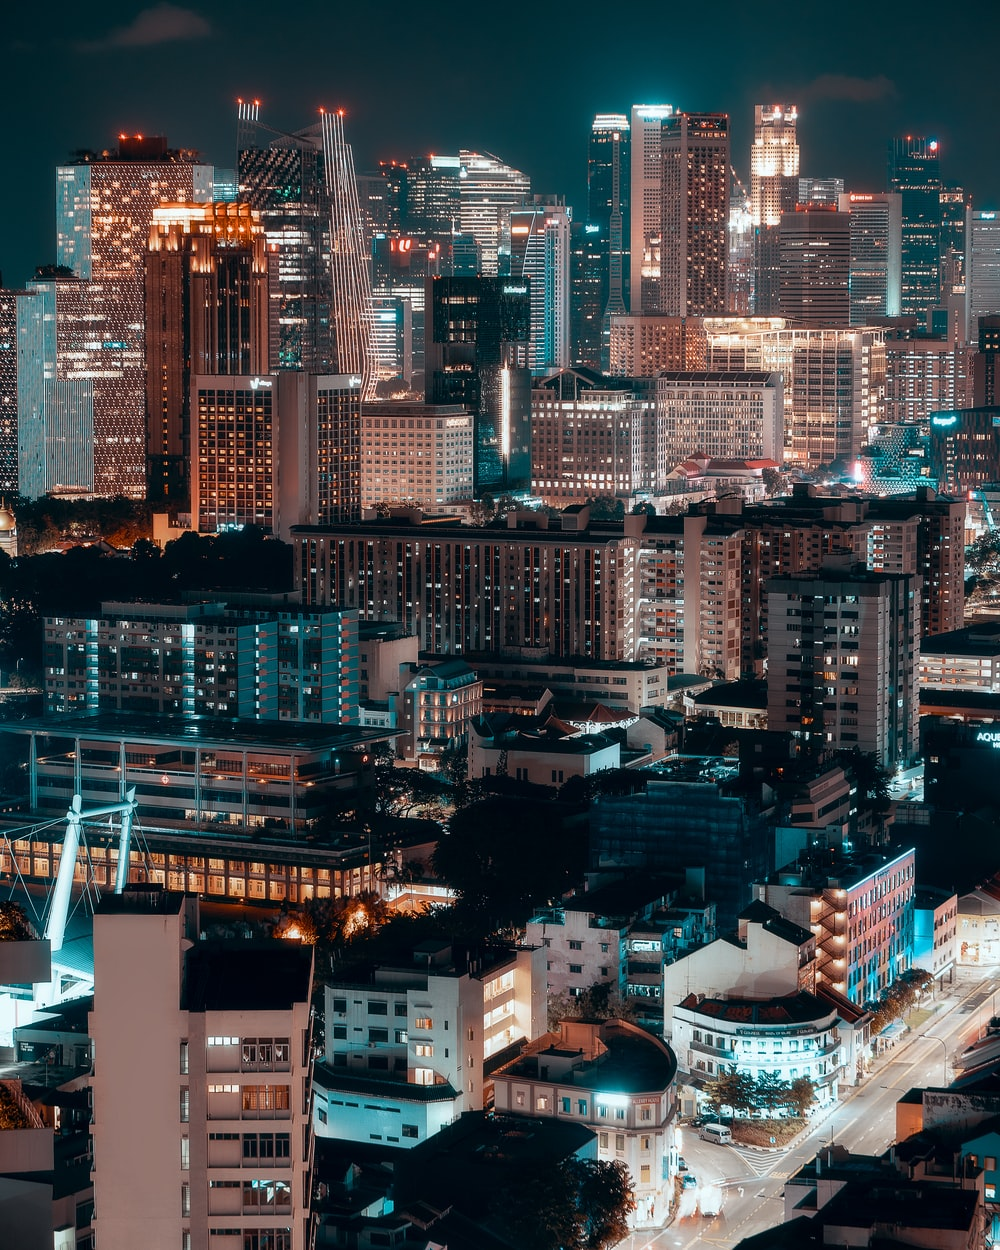 city building at night